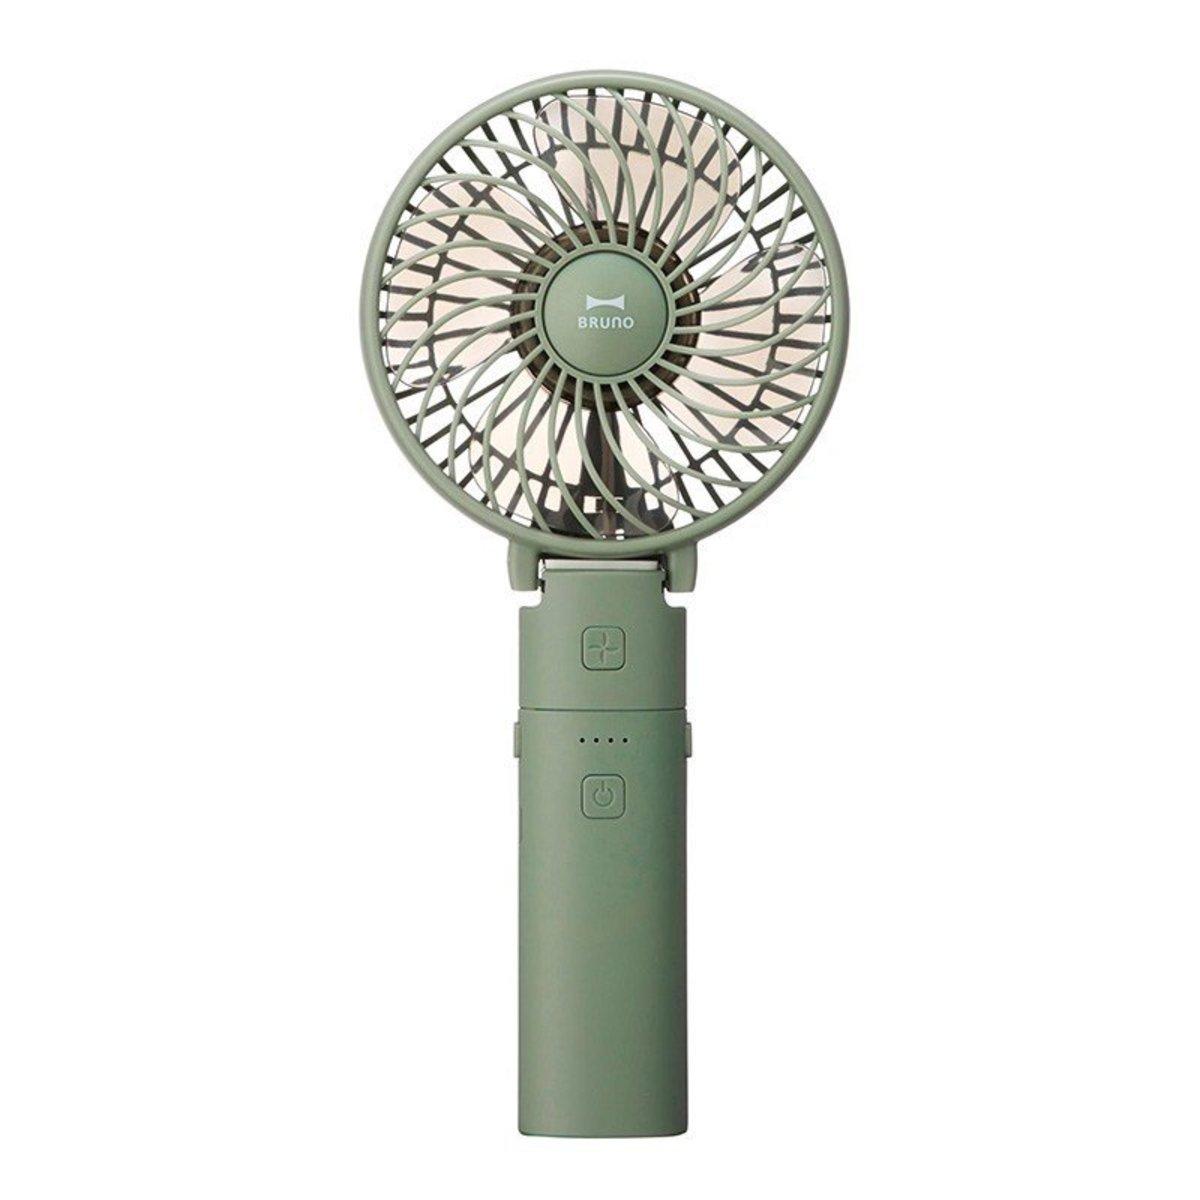 BDE029-GR USB Portable Mini Fan Green